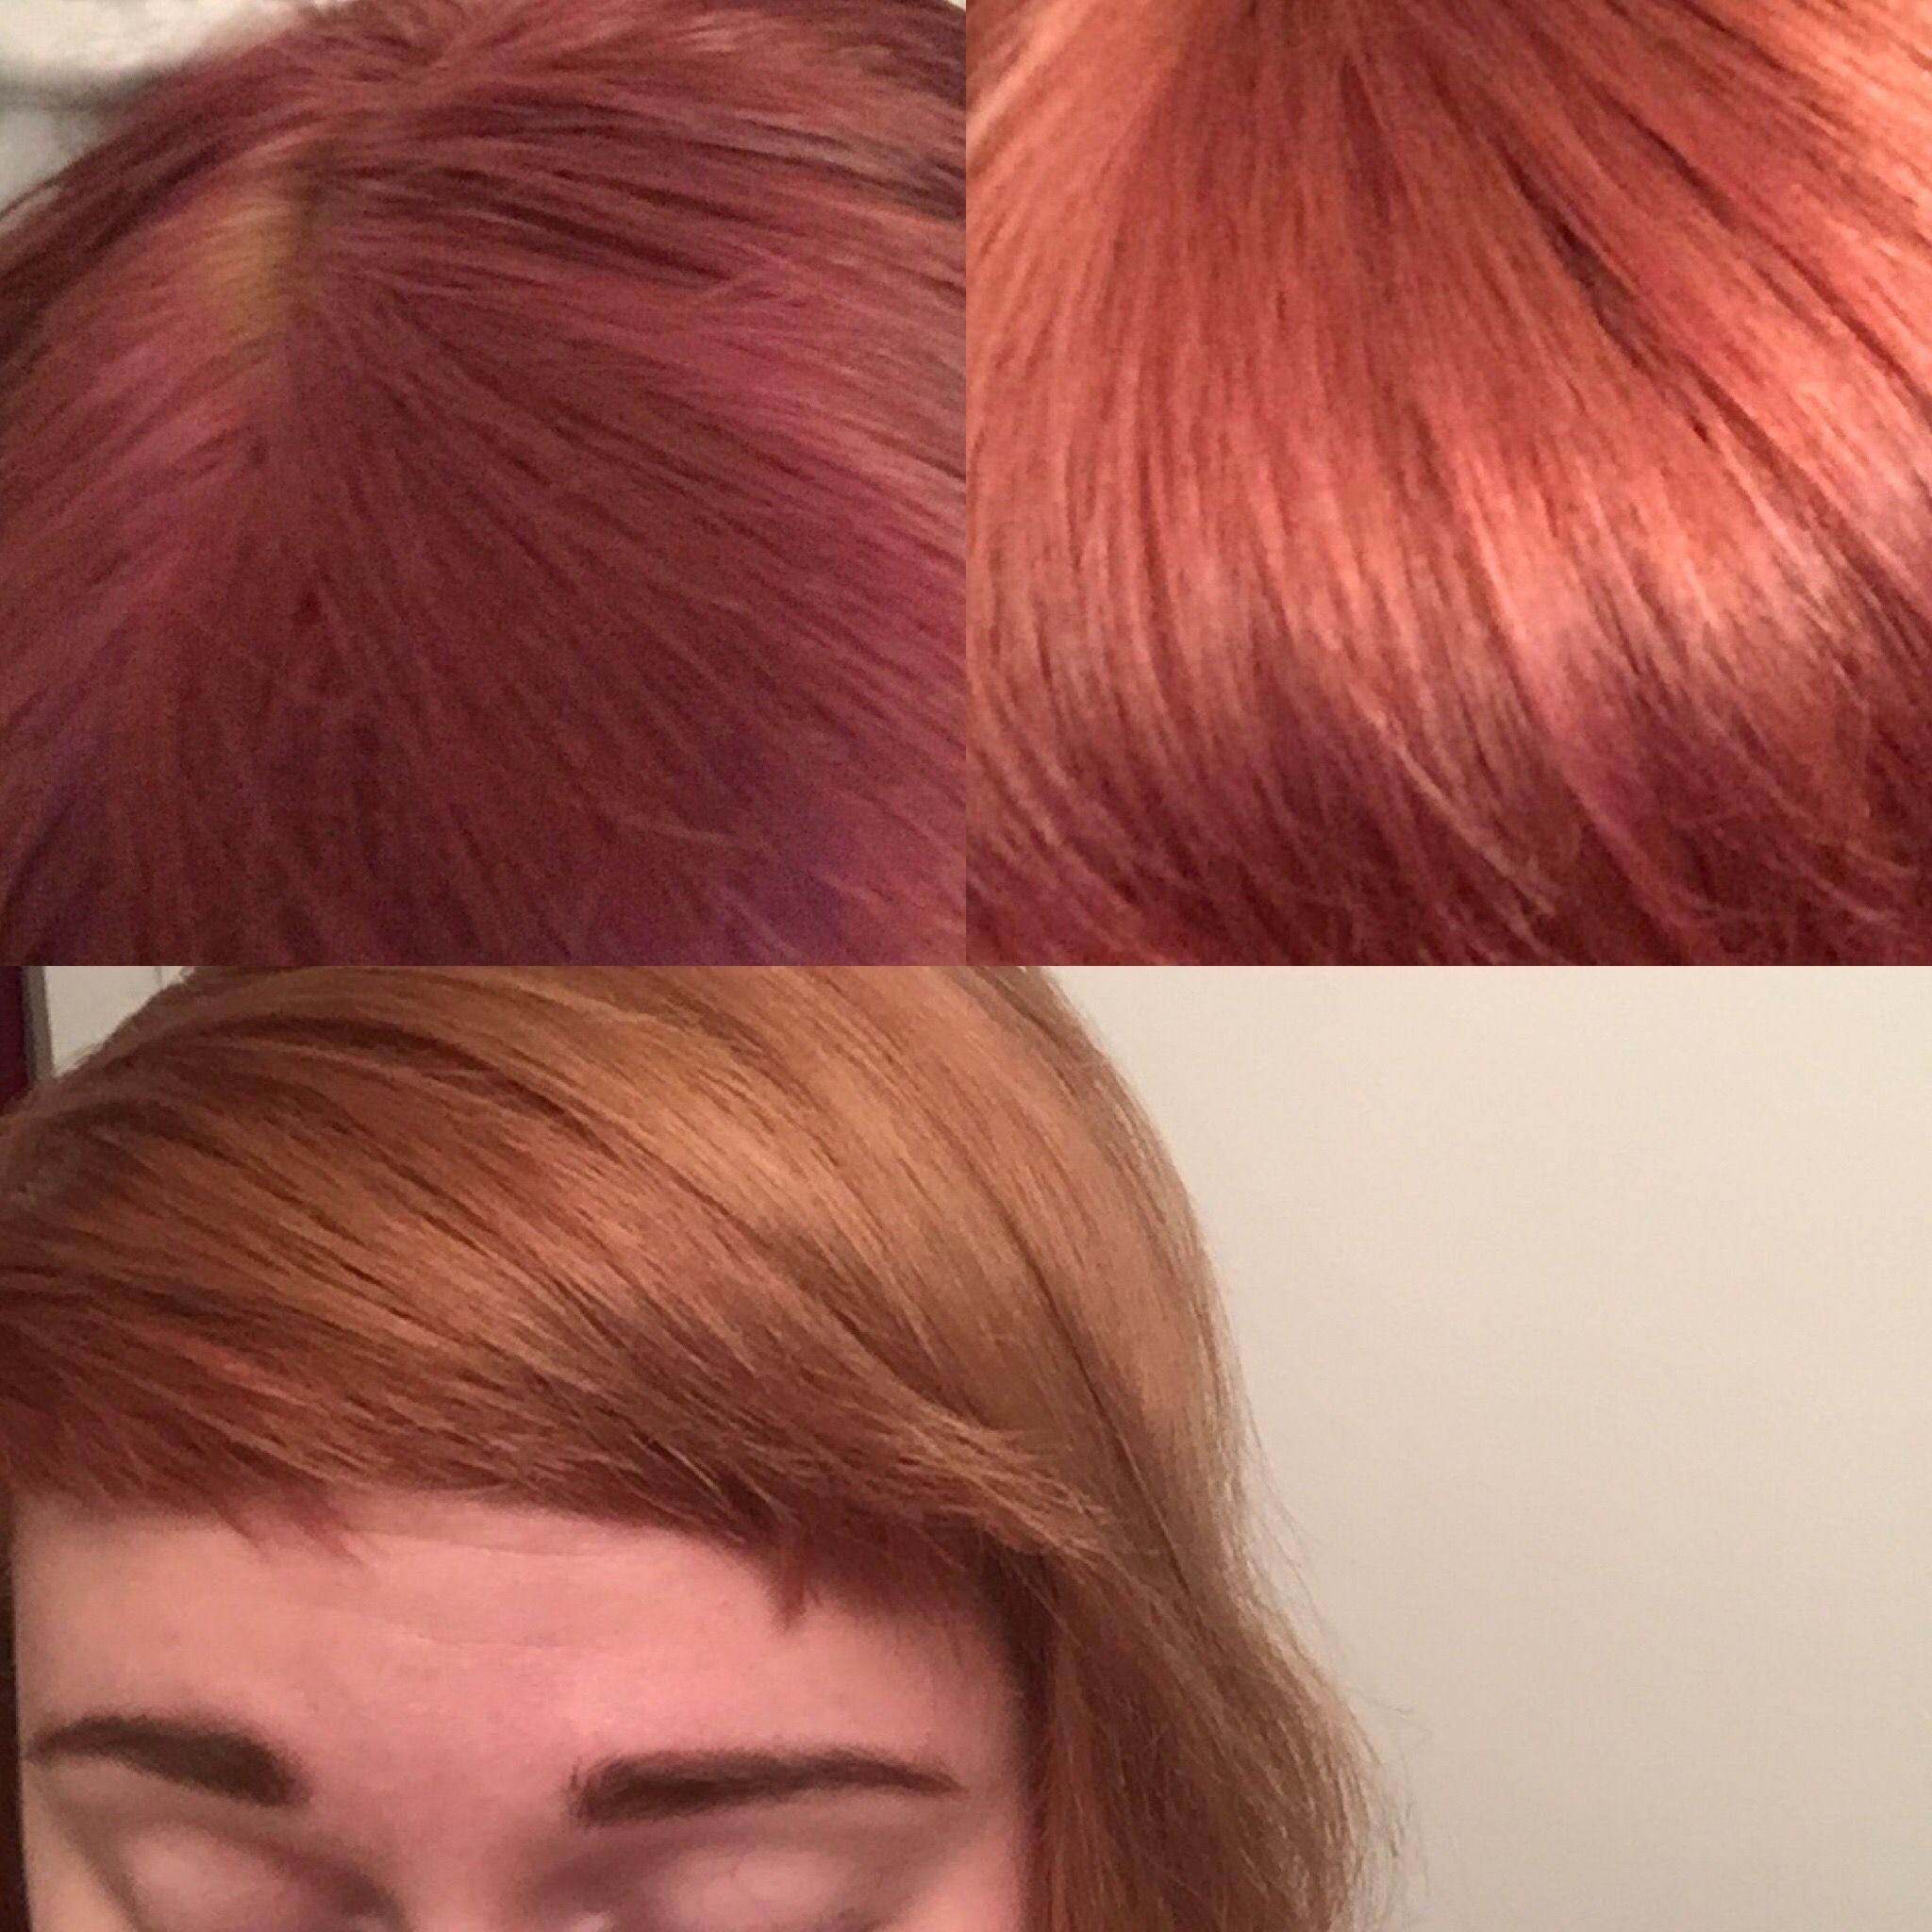 Lightening Or Removing Dye With Vitamin C And Shampoo Hair Dye Removal Lighten Dyed Hair Black Hair Dye